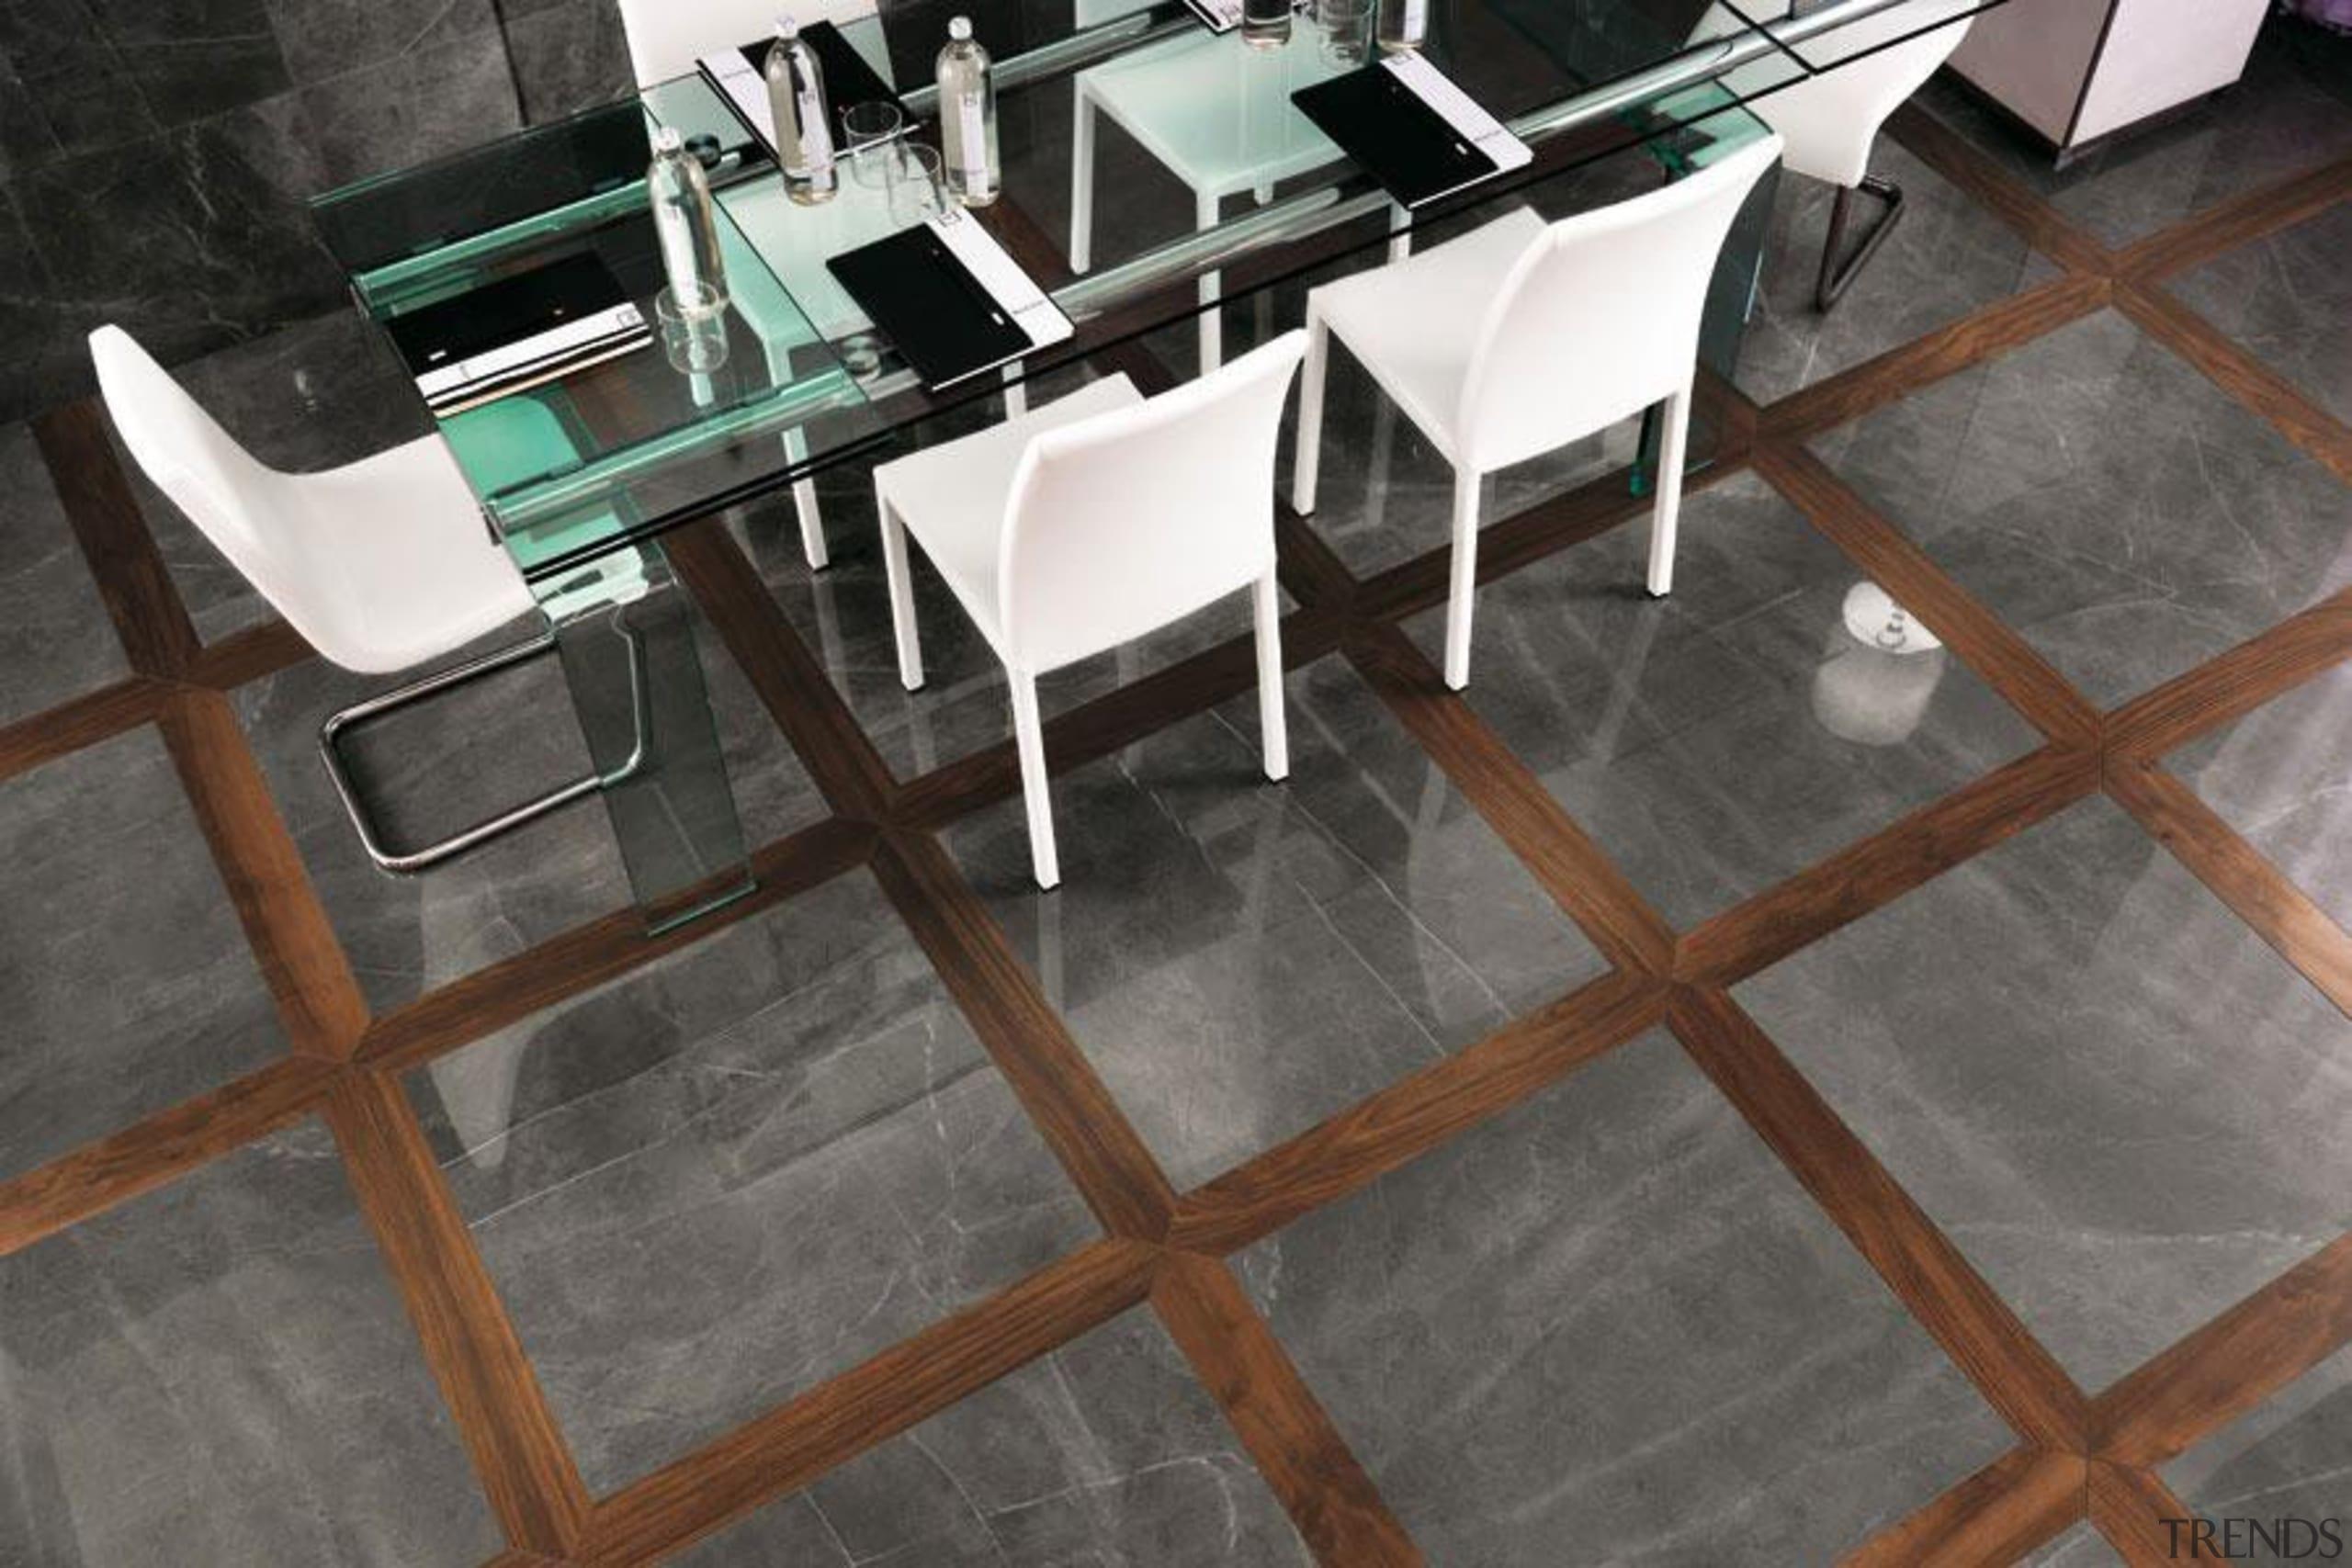 Grey stone floor tiles - Cb 1371375050023524 - chair, floor, flooring, furniture, hardwood, product design, table, tile, wood, wood flooring, gray, black